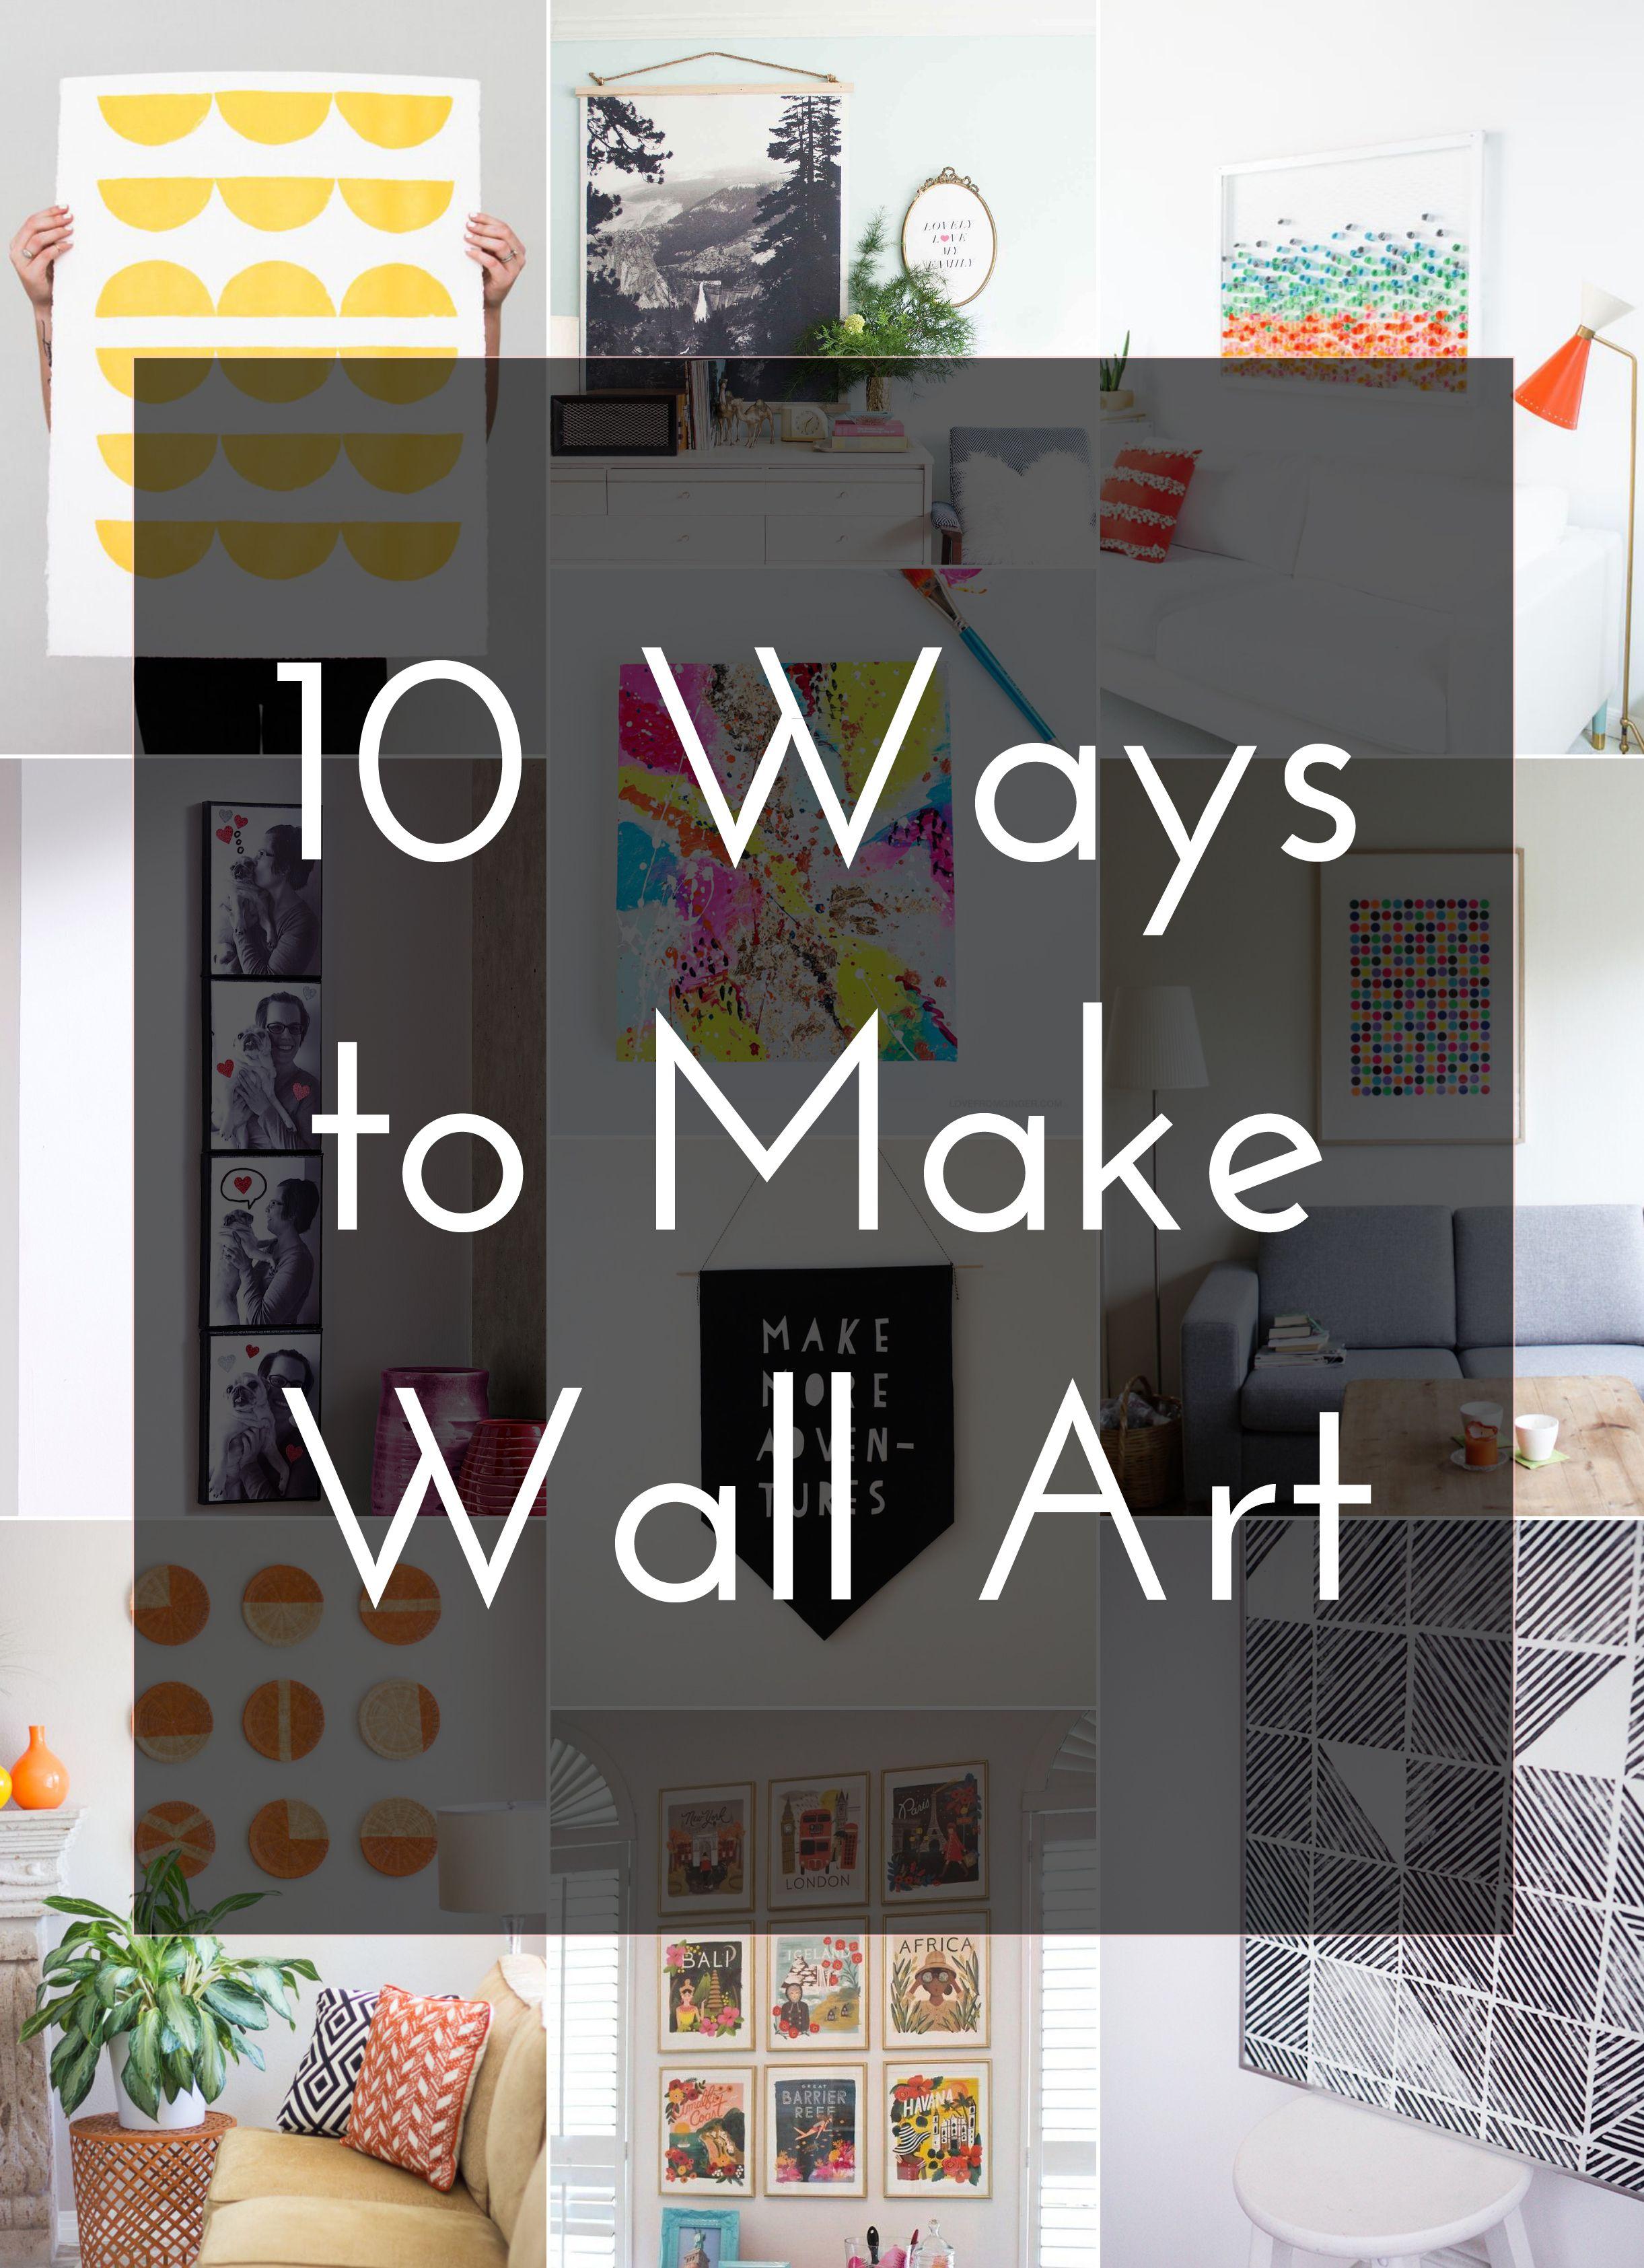 10 Ways to Make Wall Art Diy wall art, Diy canvas art